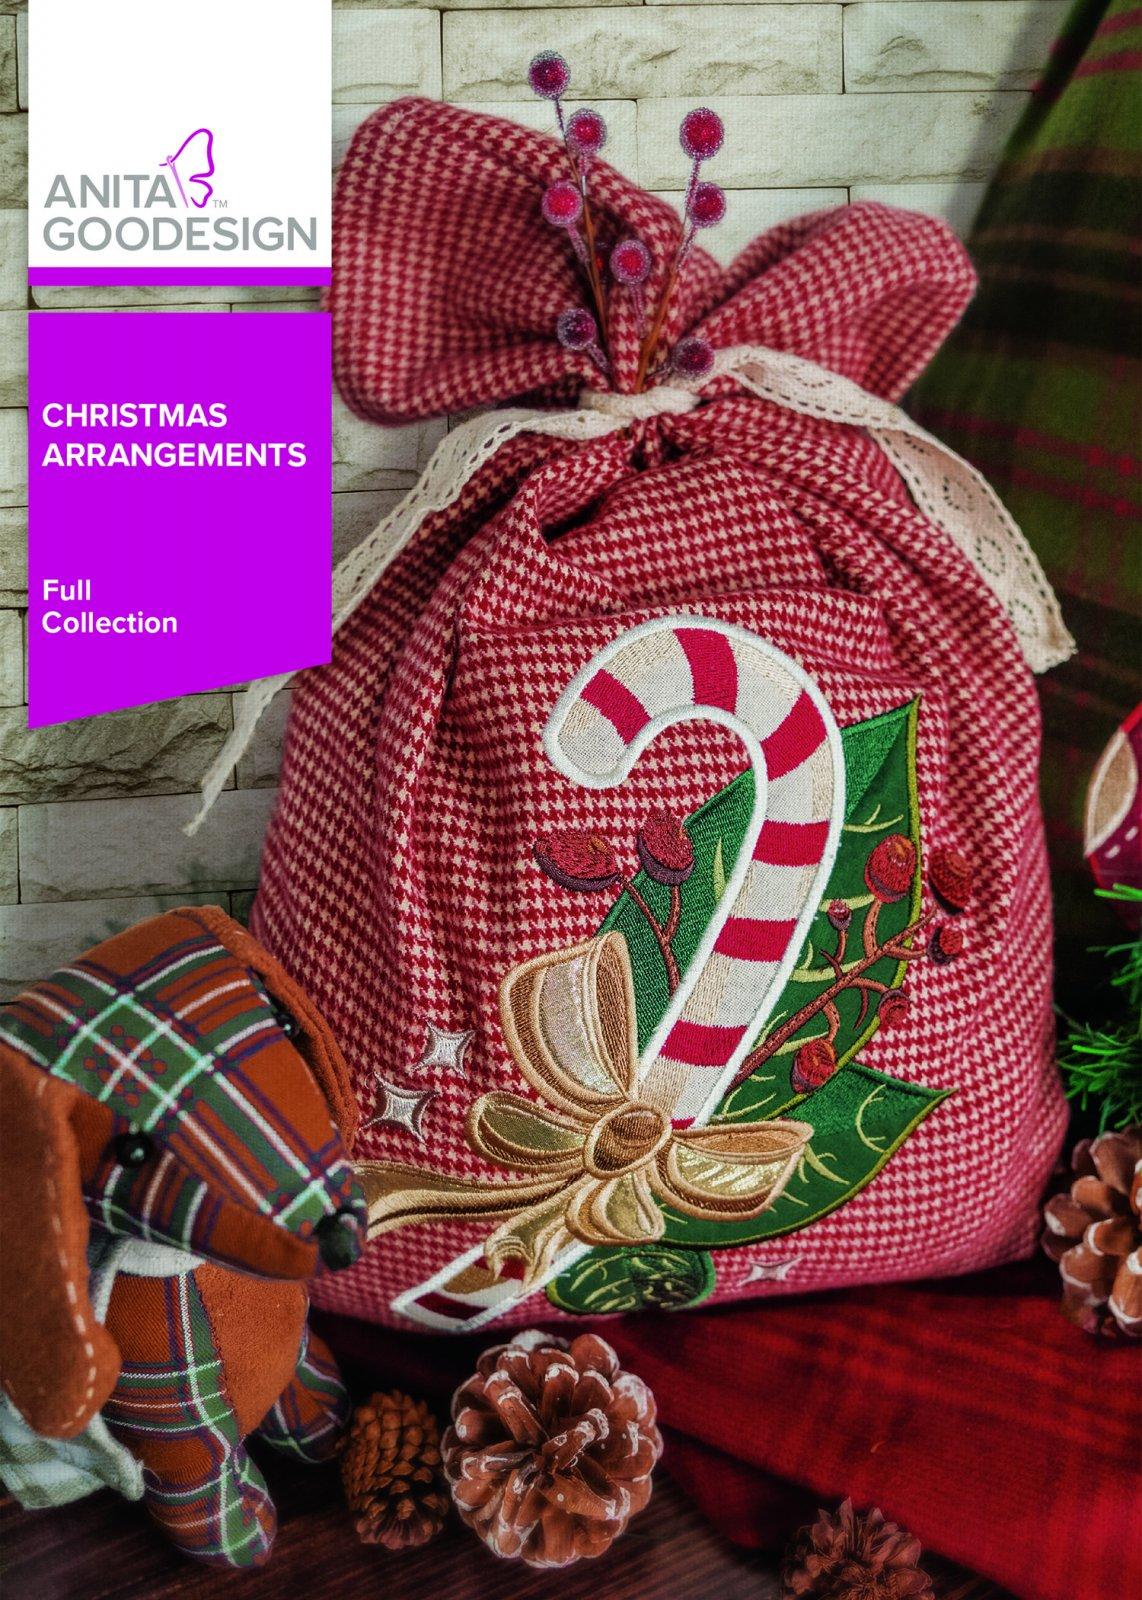 Christmas Arrangements - Anita Goodesign Full Collection